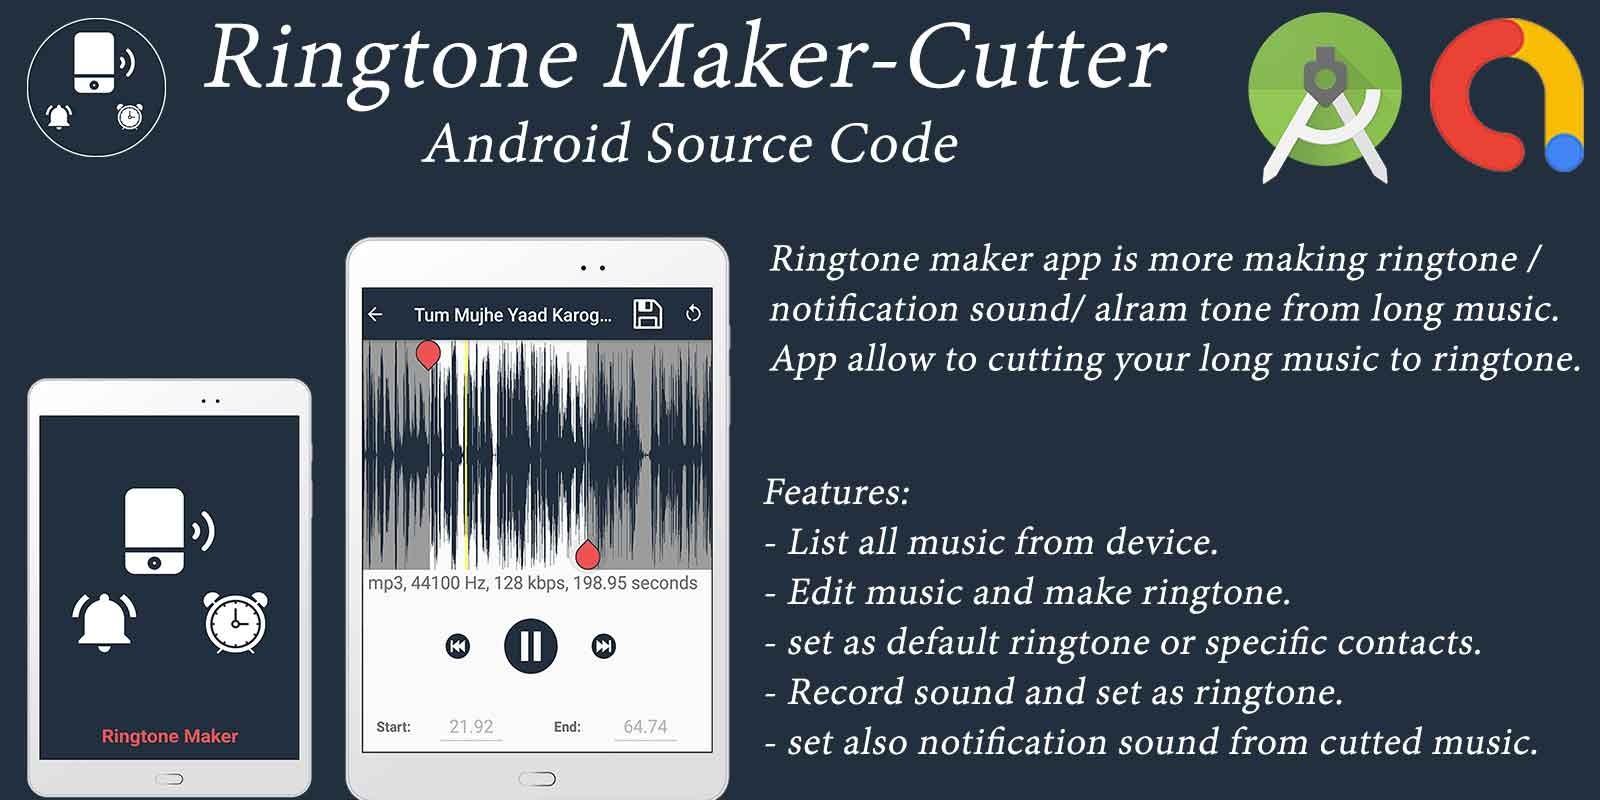 Ringtone Maker